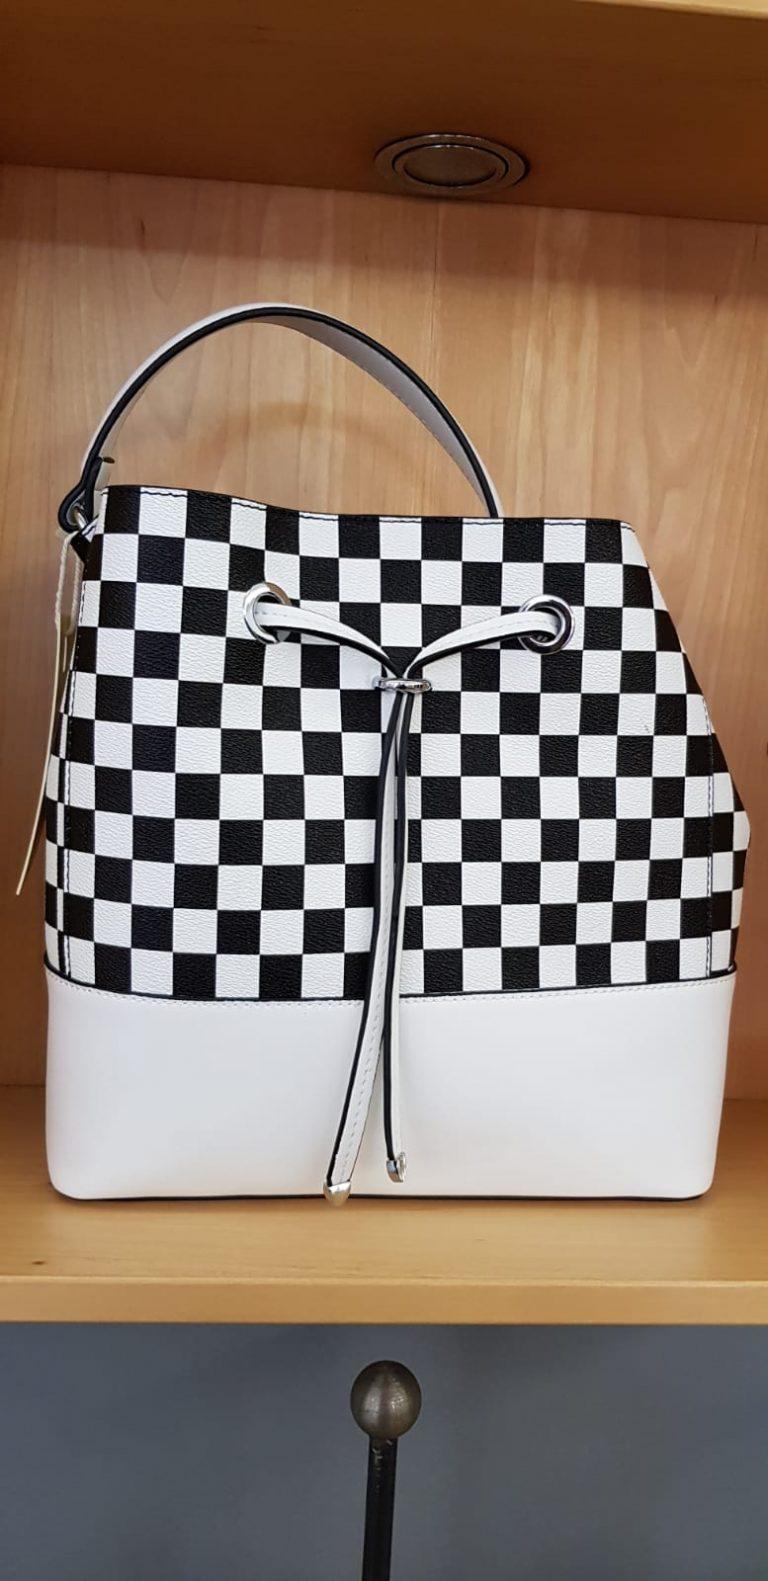 Accessoire / modische Taschen bei Bini-Moden, Castrop-Rauxel